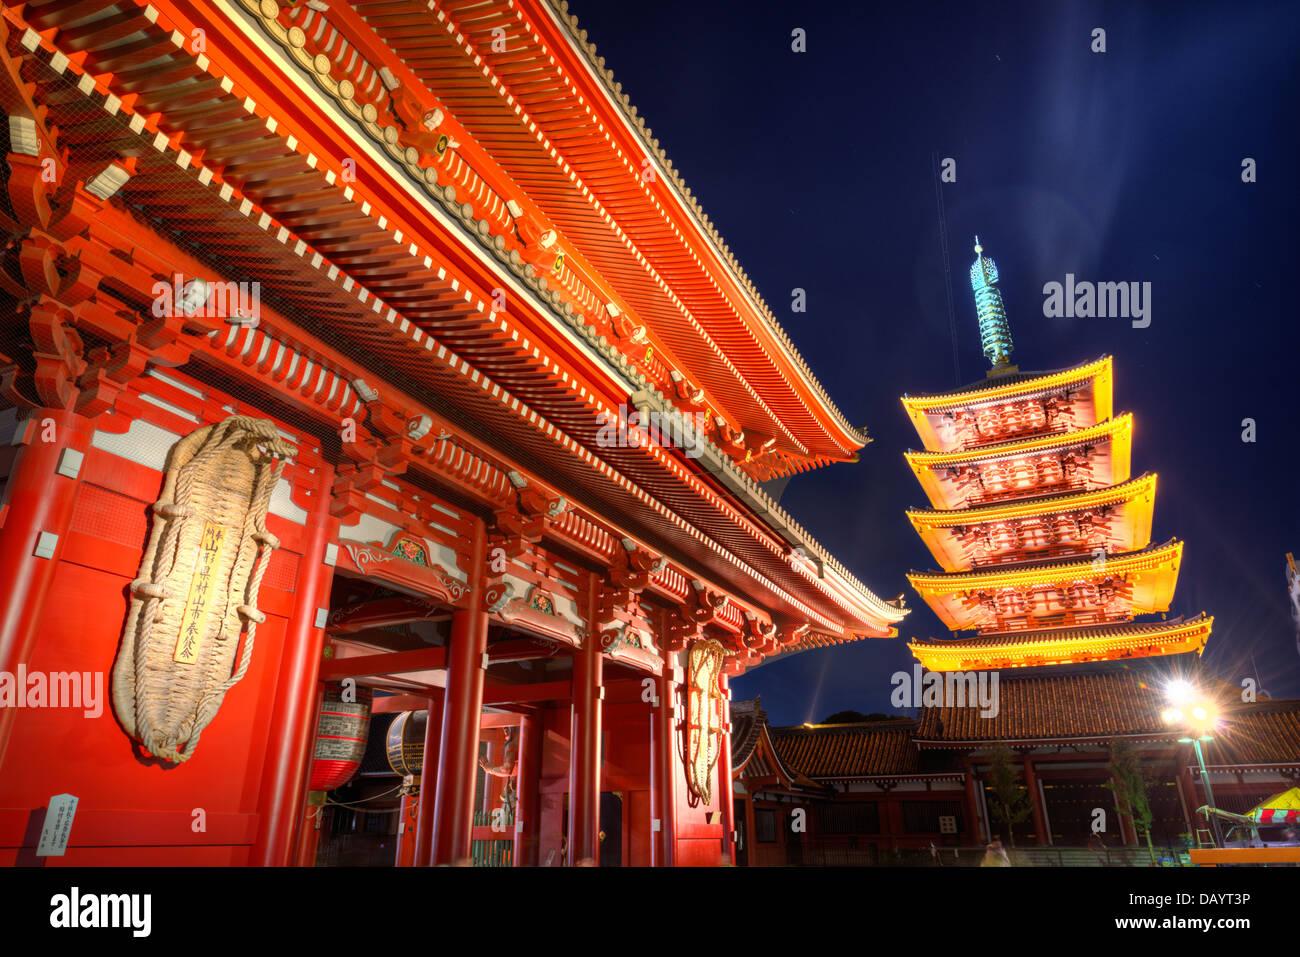 Gate and pagoda of Senso-ji shrine in Tokyo, Japan. Stock Photo